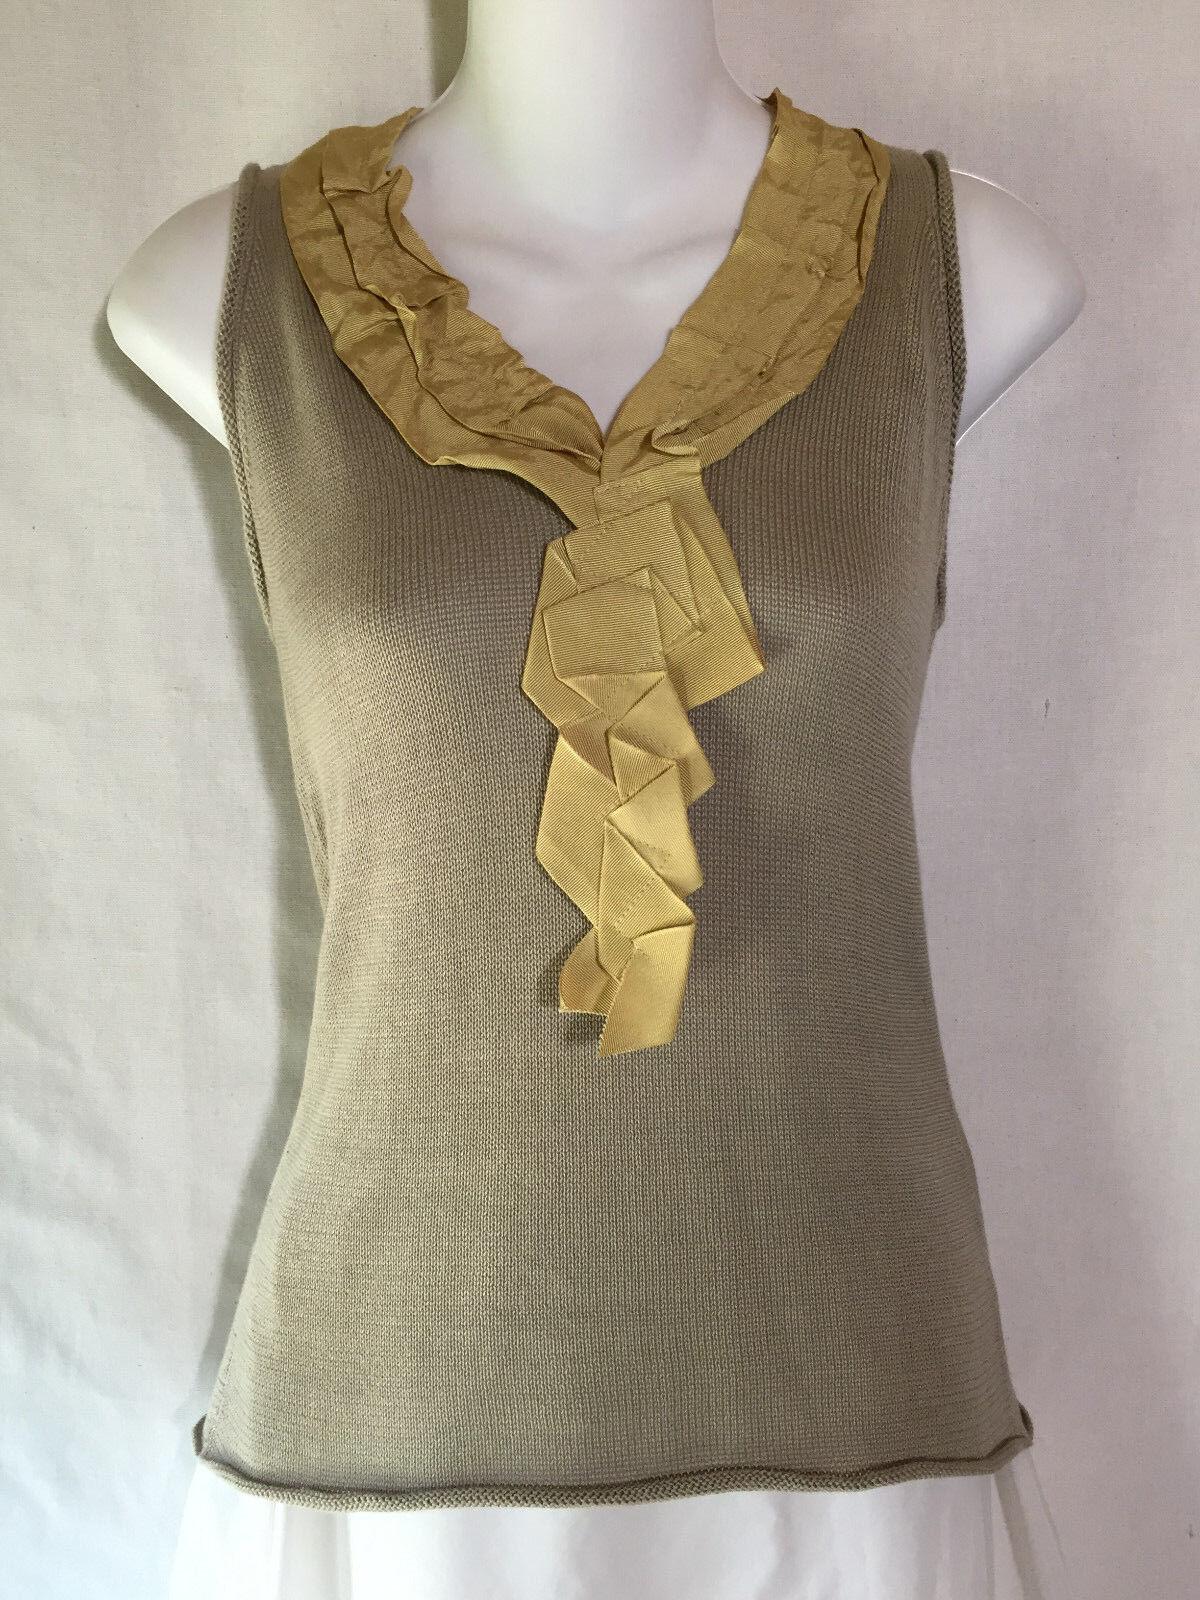 Denise Allen Robinson Neesh Soft Pima Cotton Knit Tunic Tank Sweater Shirt Top S